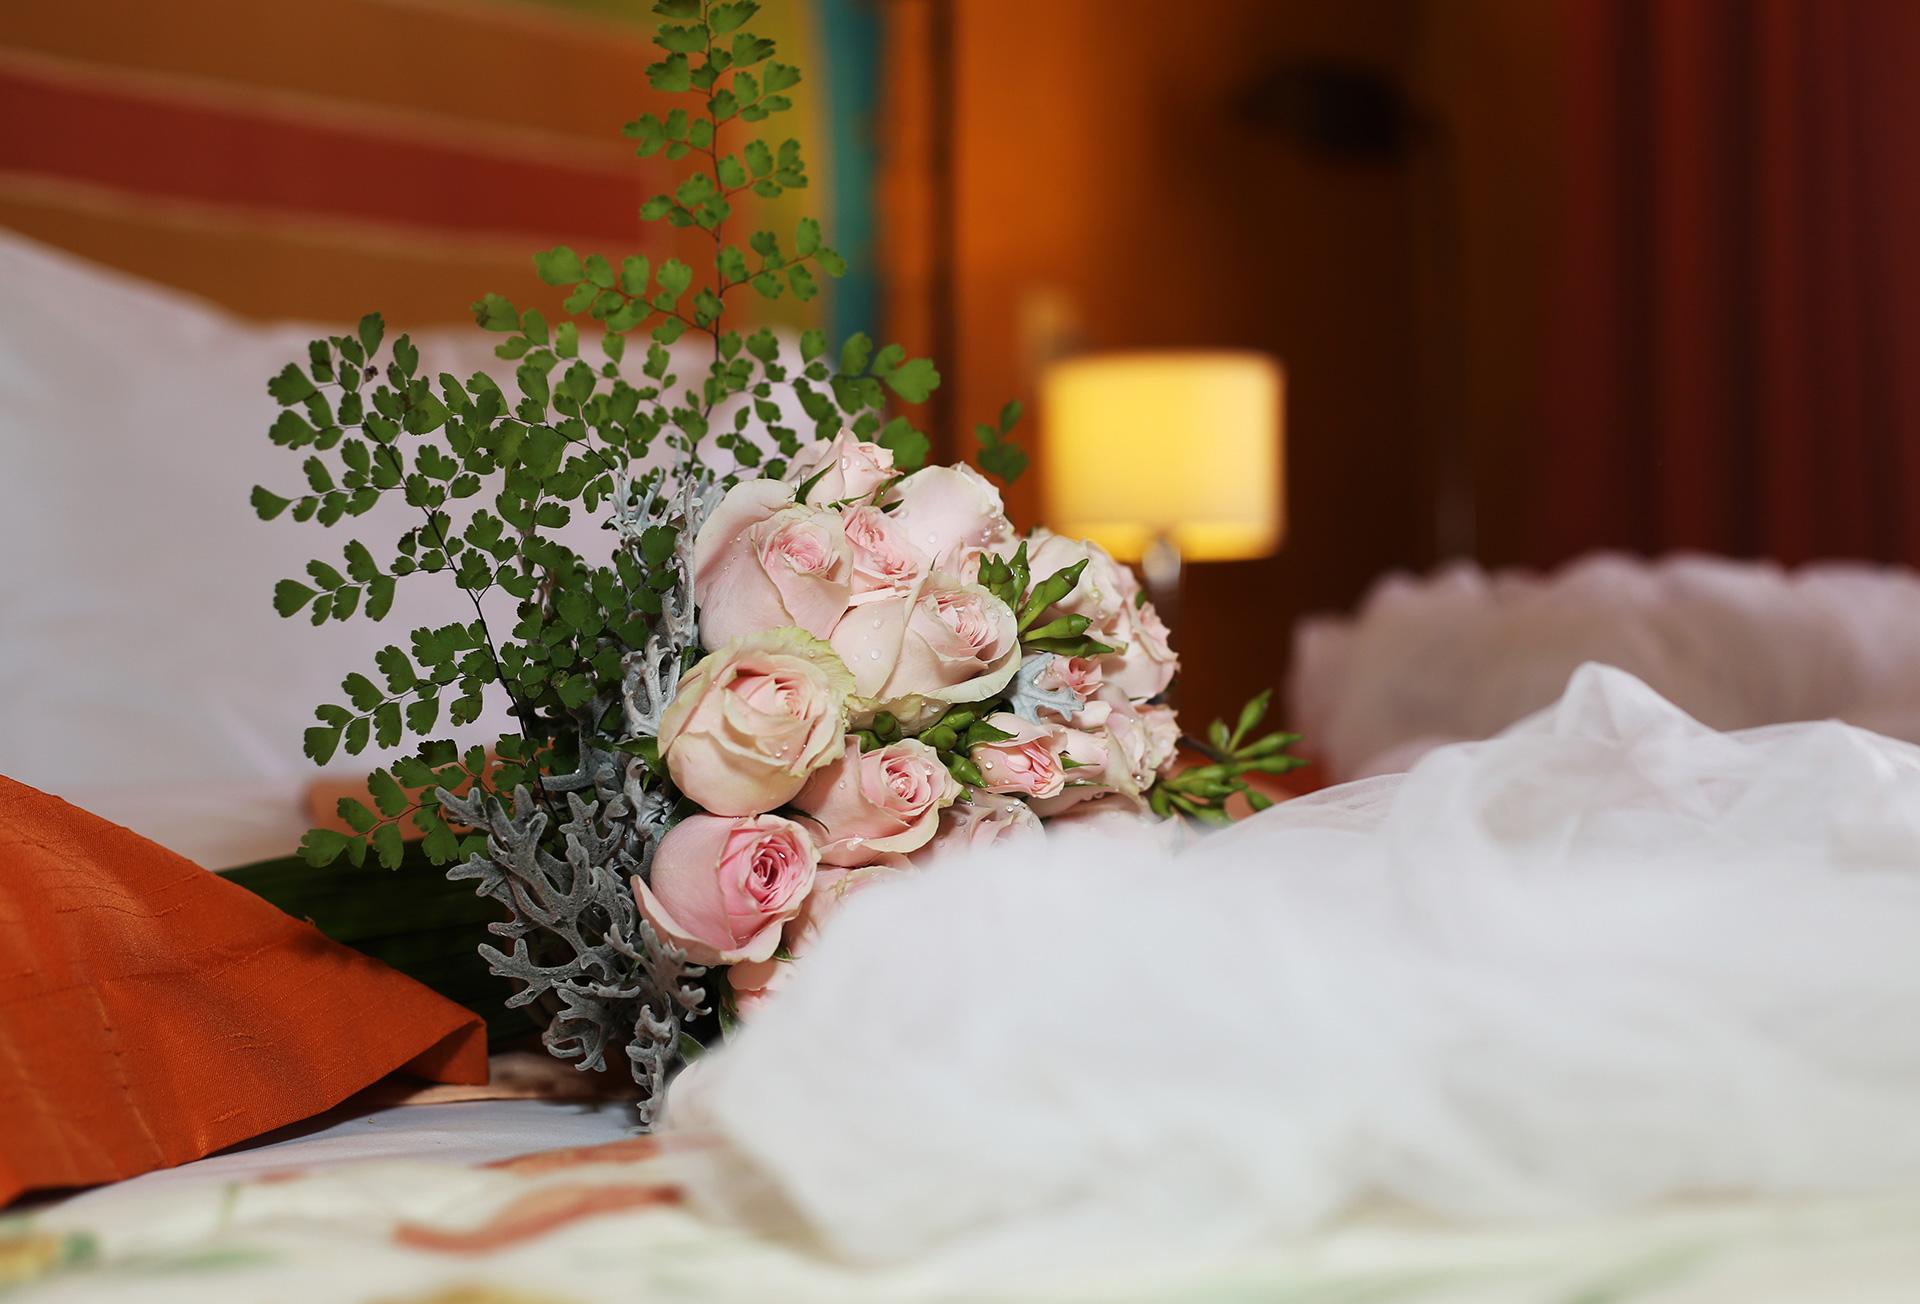 IMG_Hotel-Villa-Rossa-Sinfonia-das-Flores-Juba-Alves-Fotografia-sr-sp-131